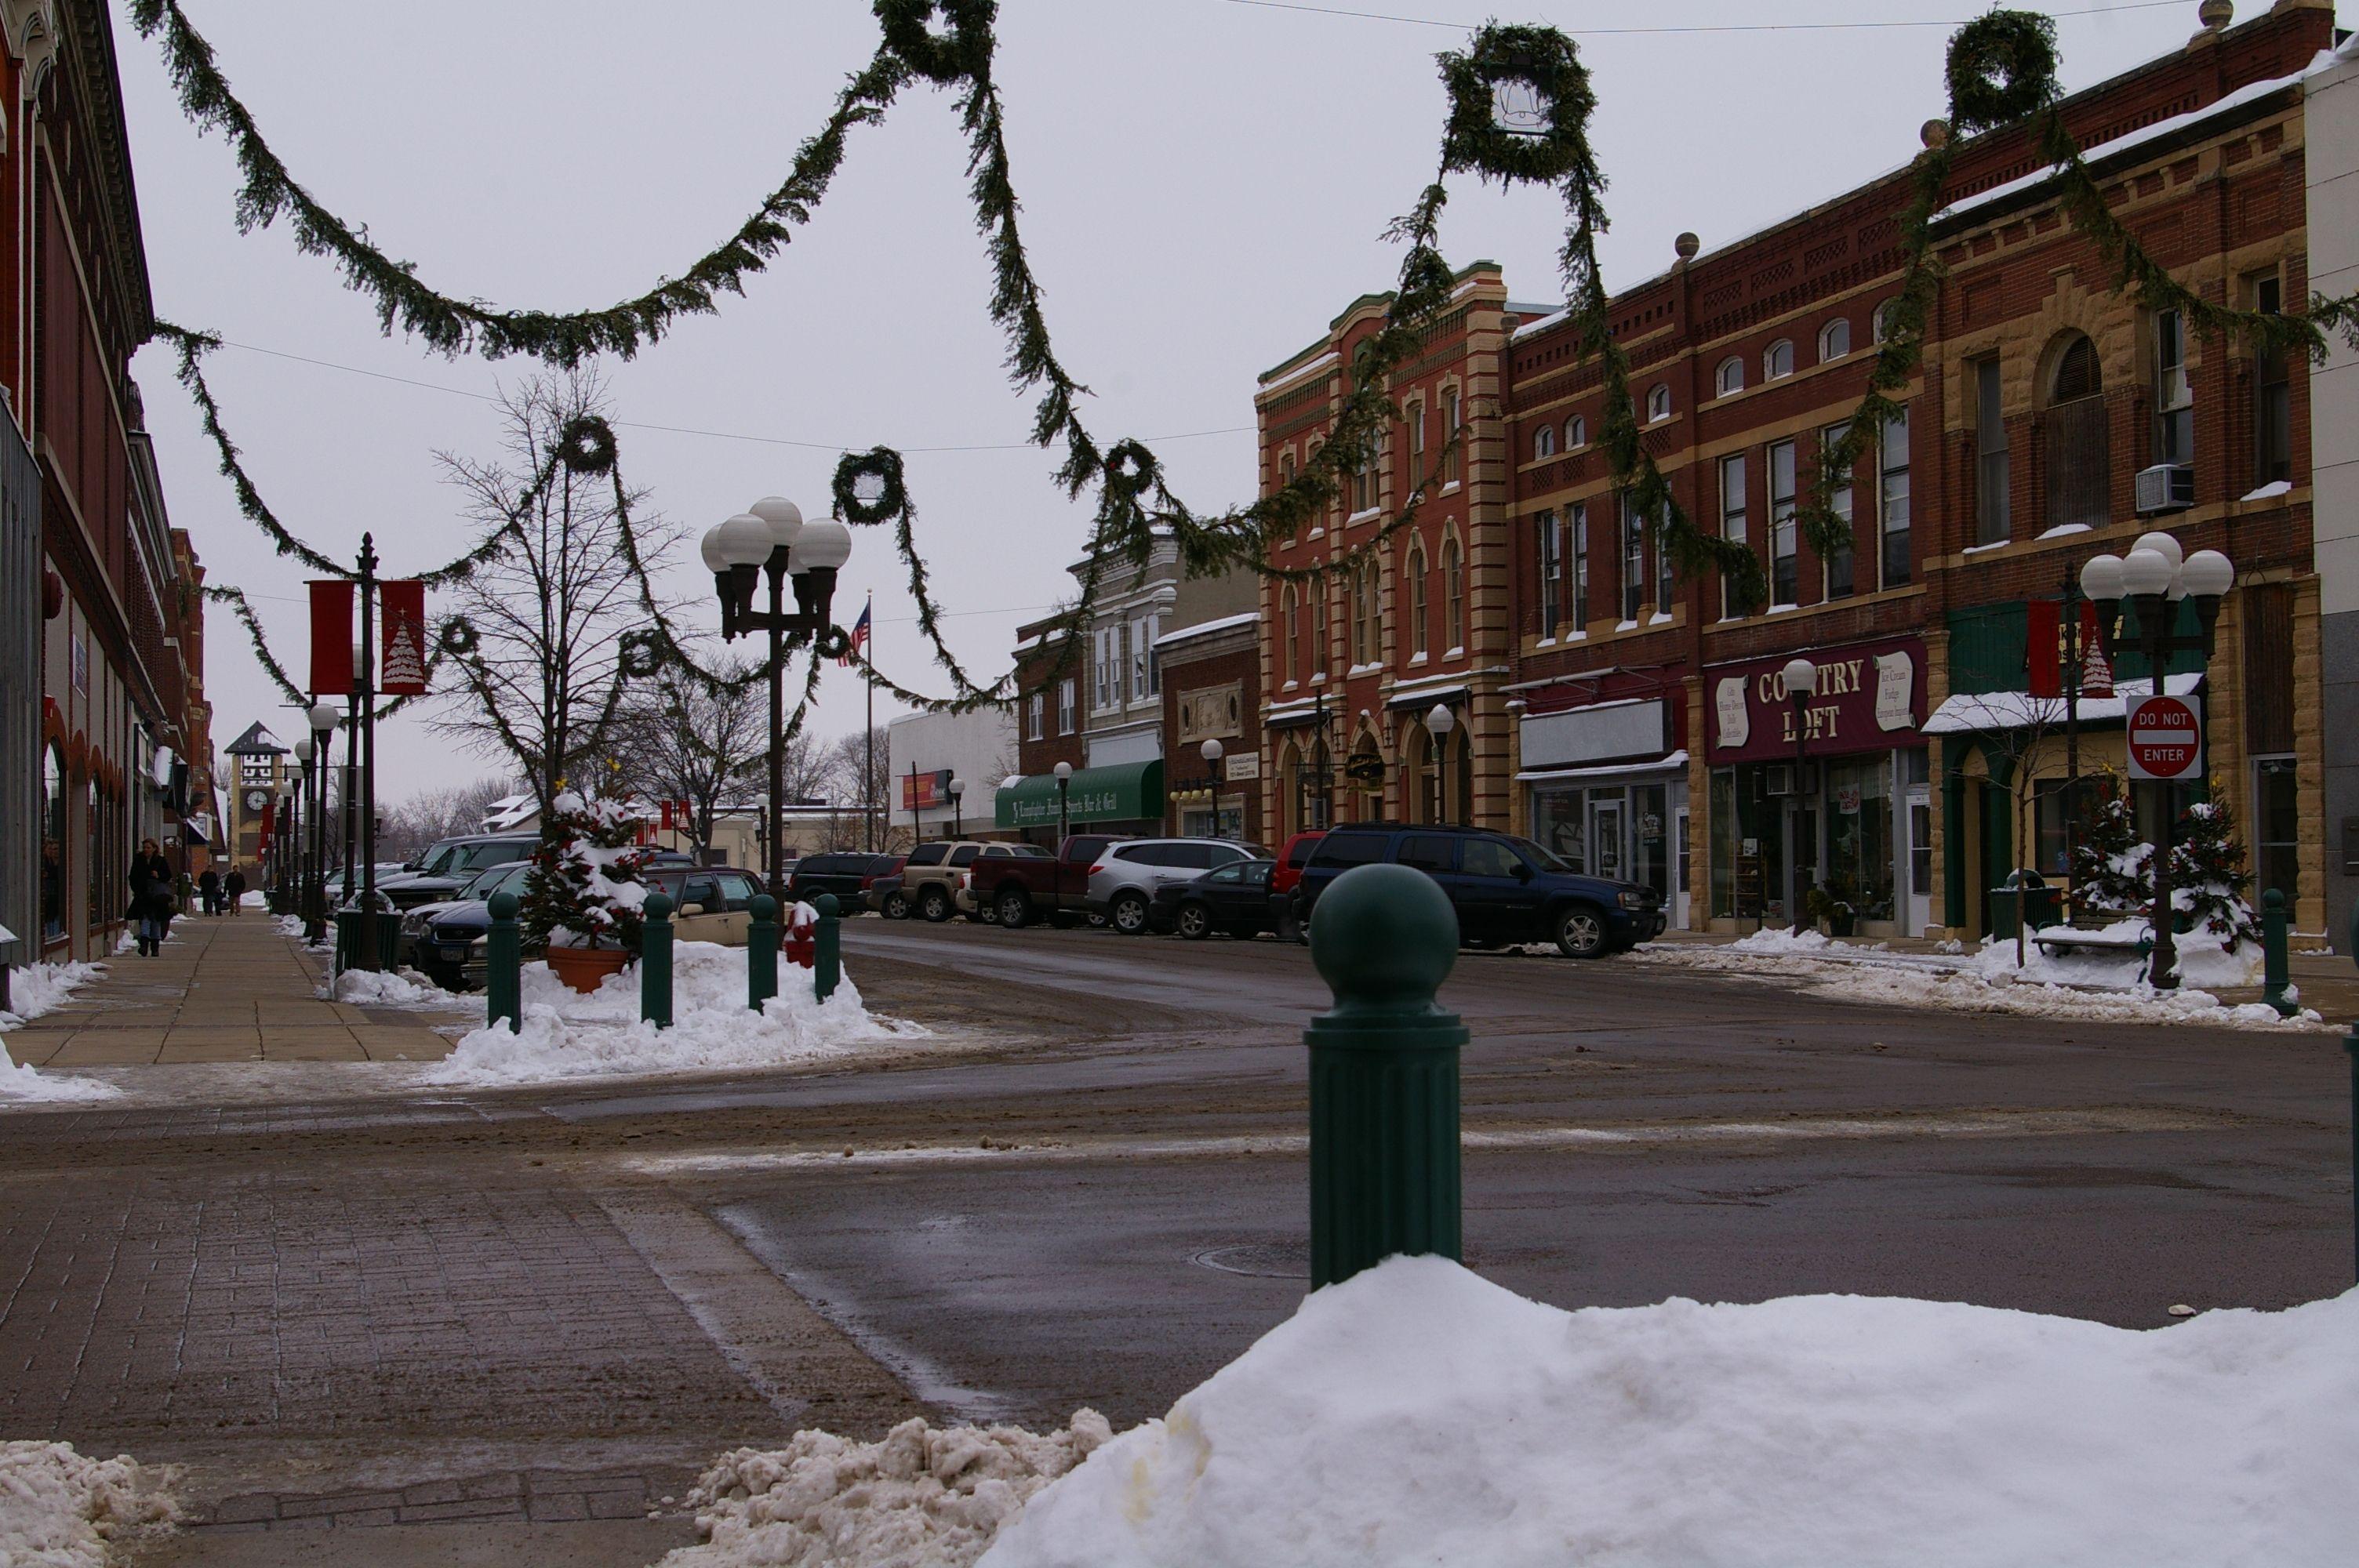 Ulm red light district